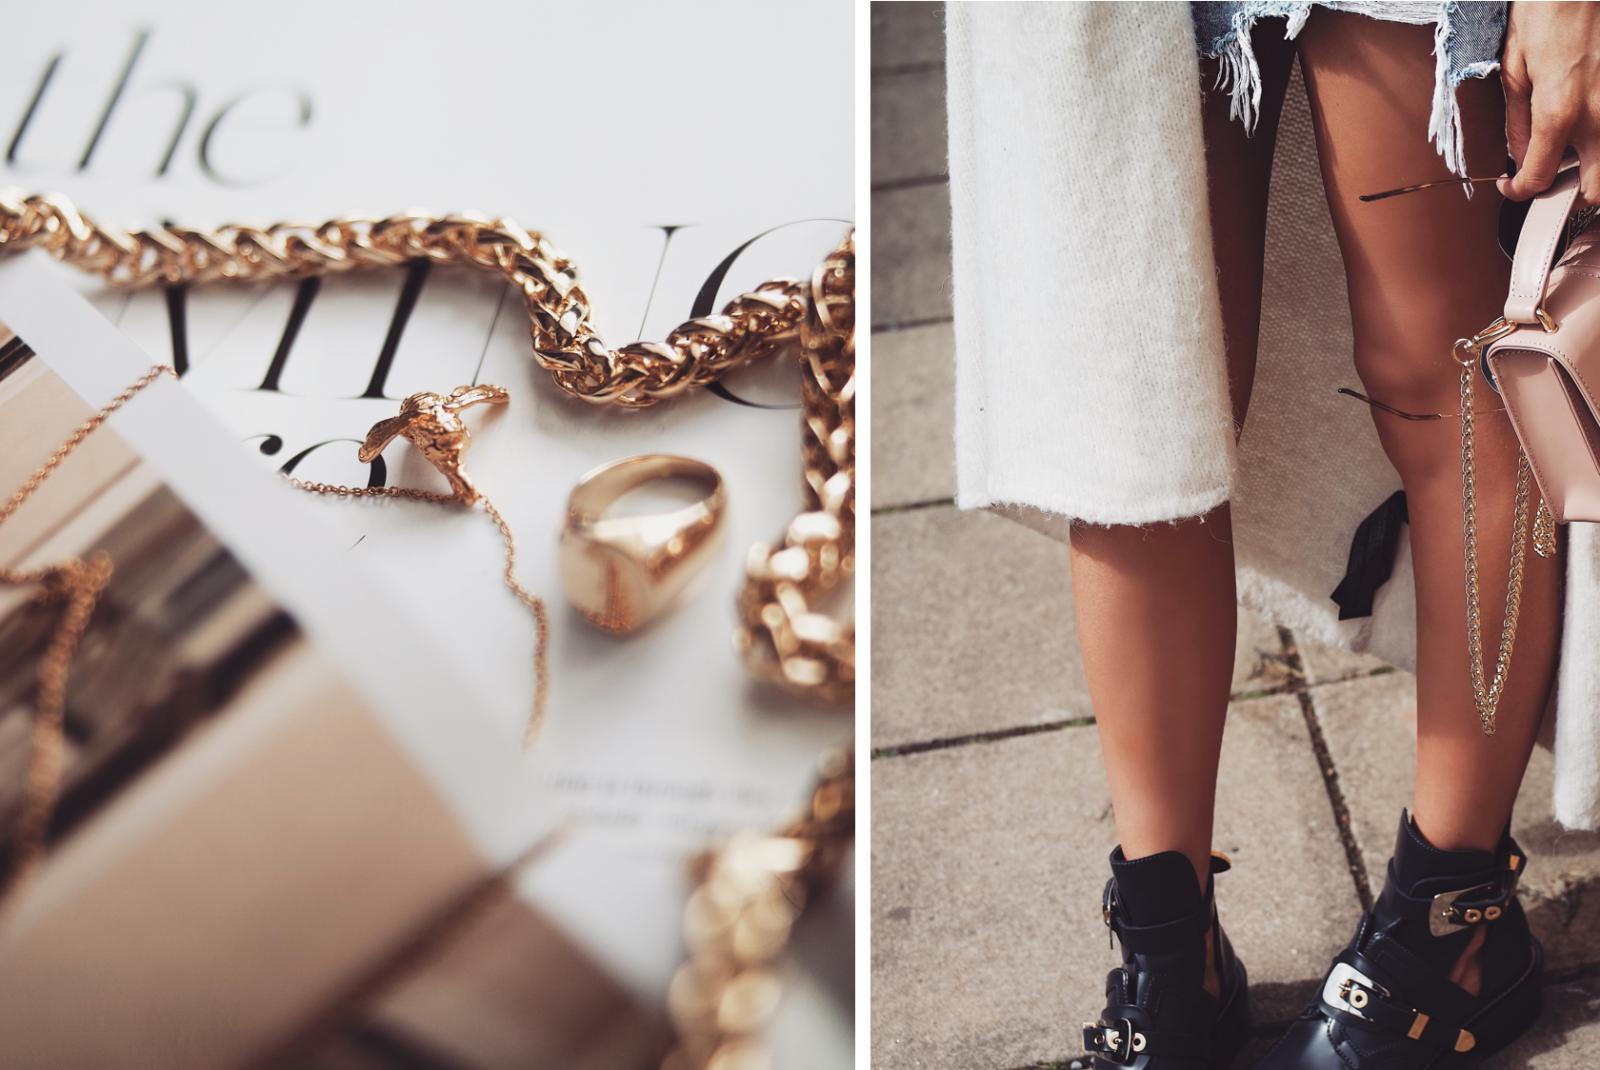 Jewelstreet - Flatlet Gold Jewellery Collection